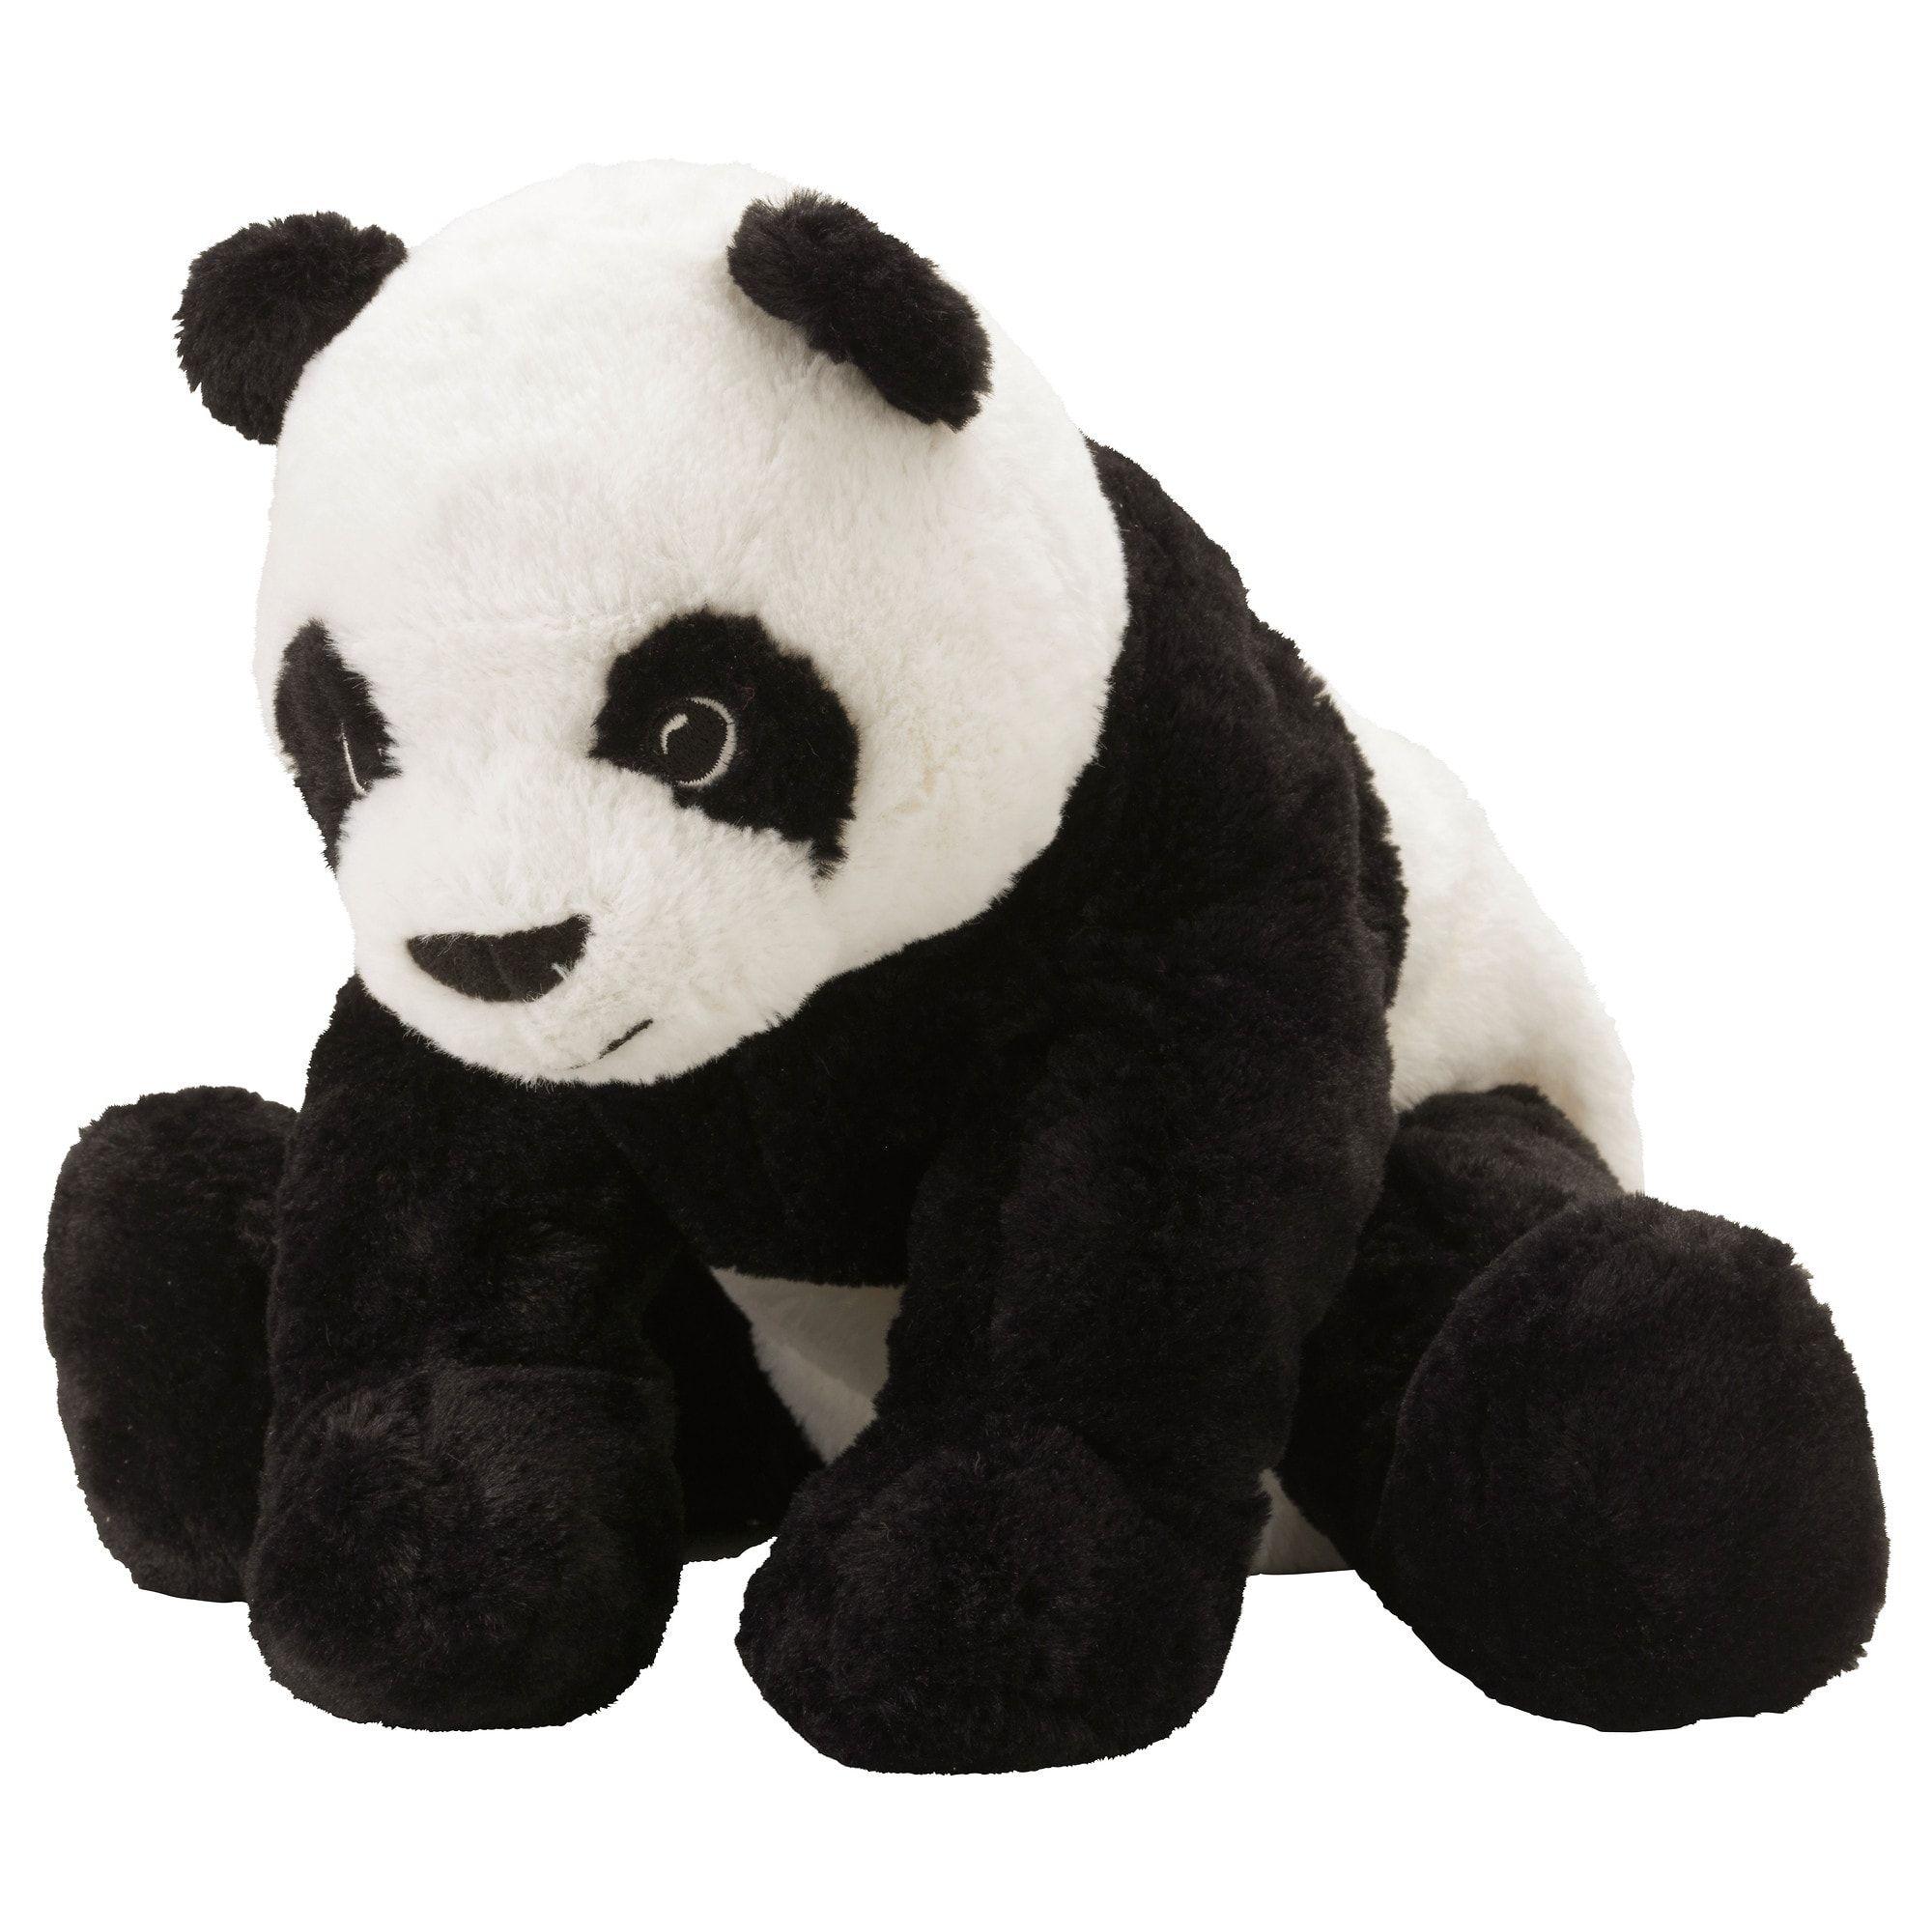 Ikea Kramig White Black Soft Toy Panda Stuffed Animal Panda